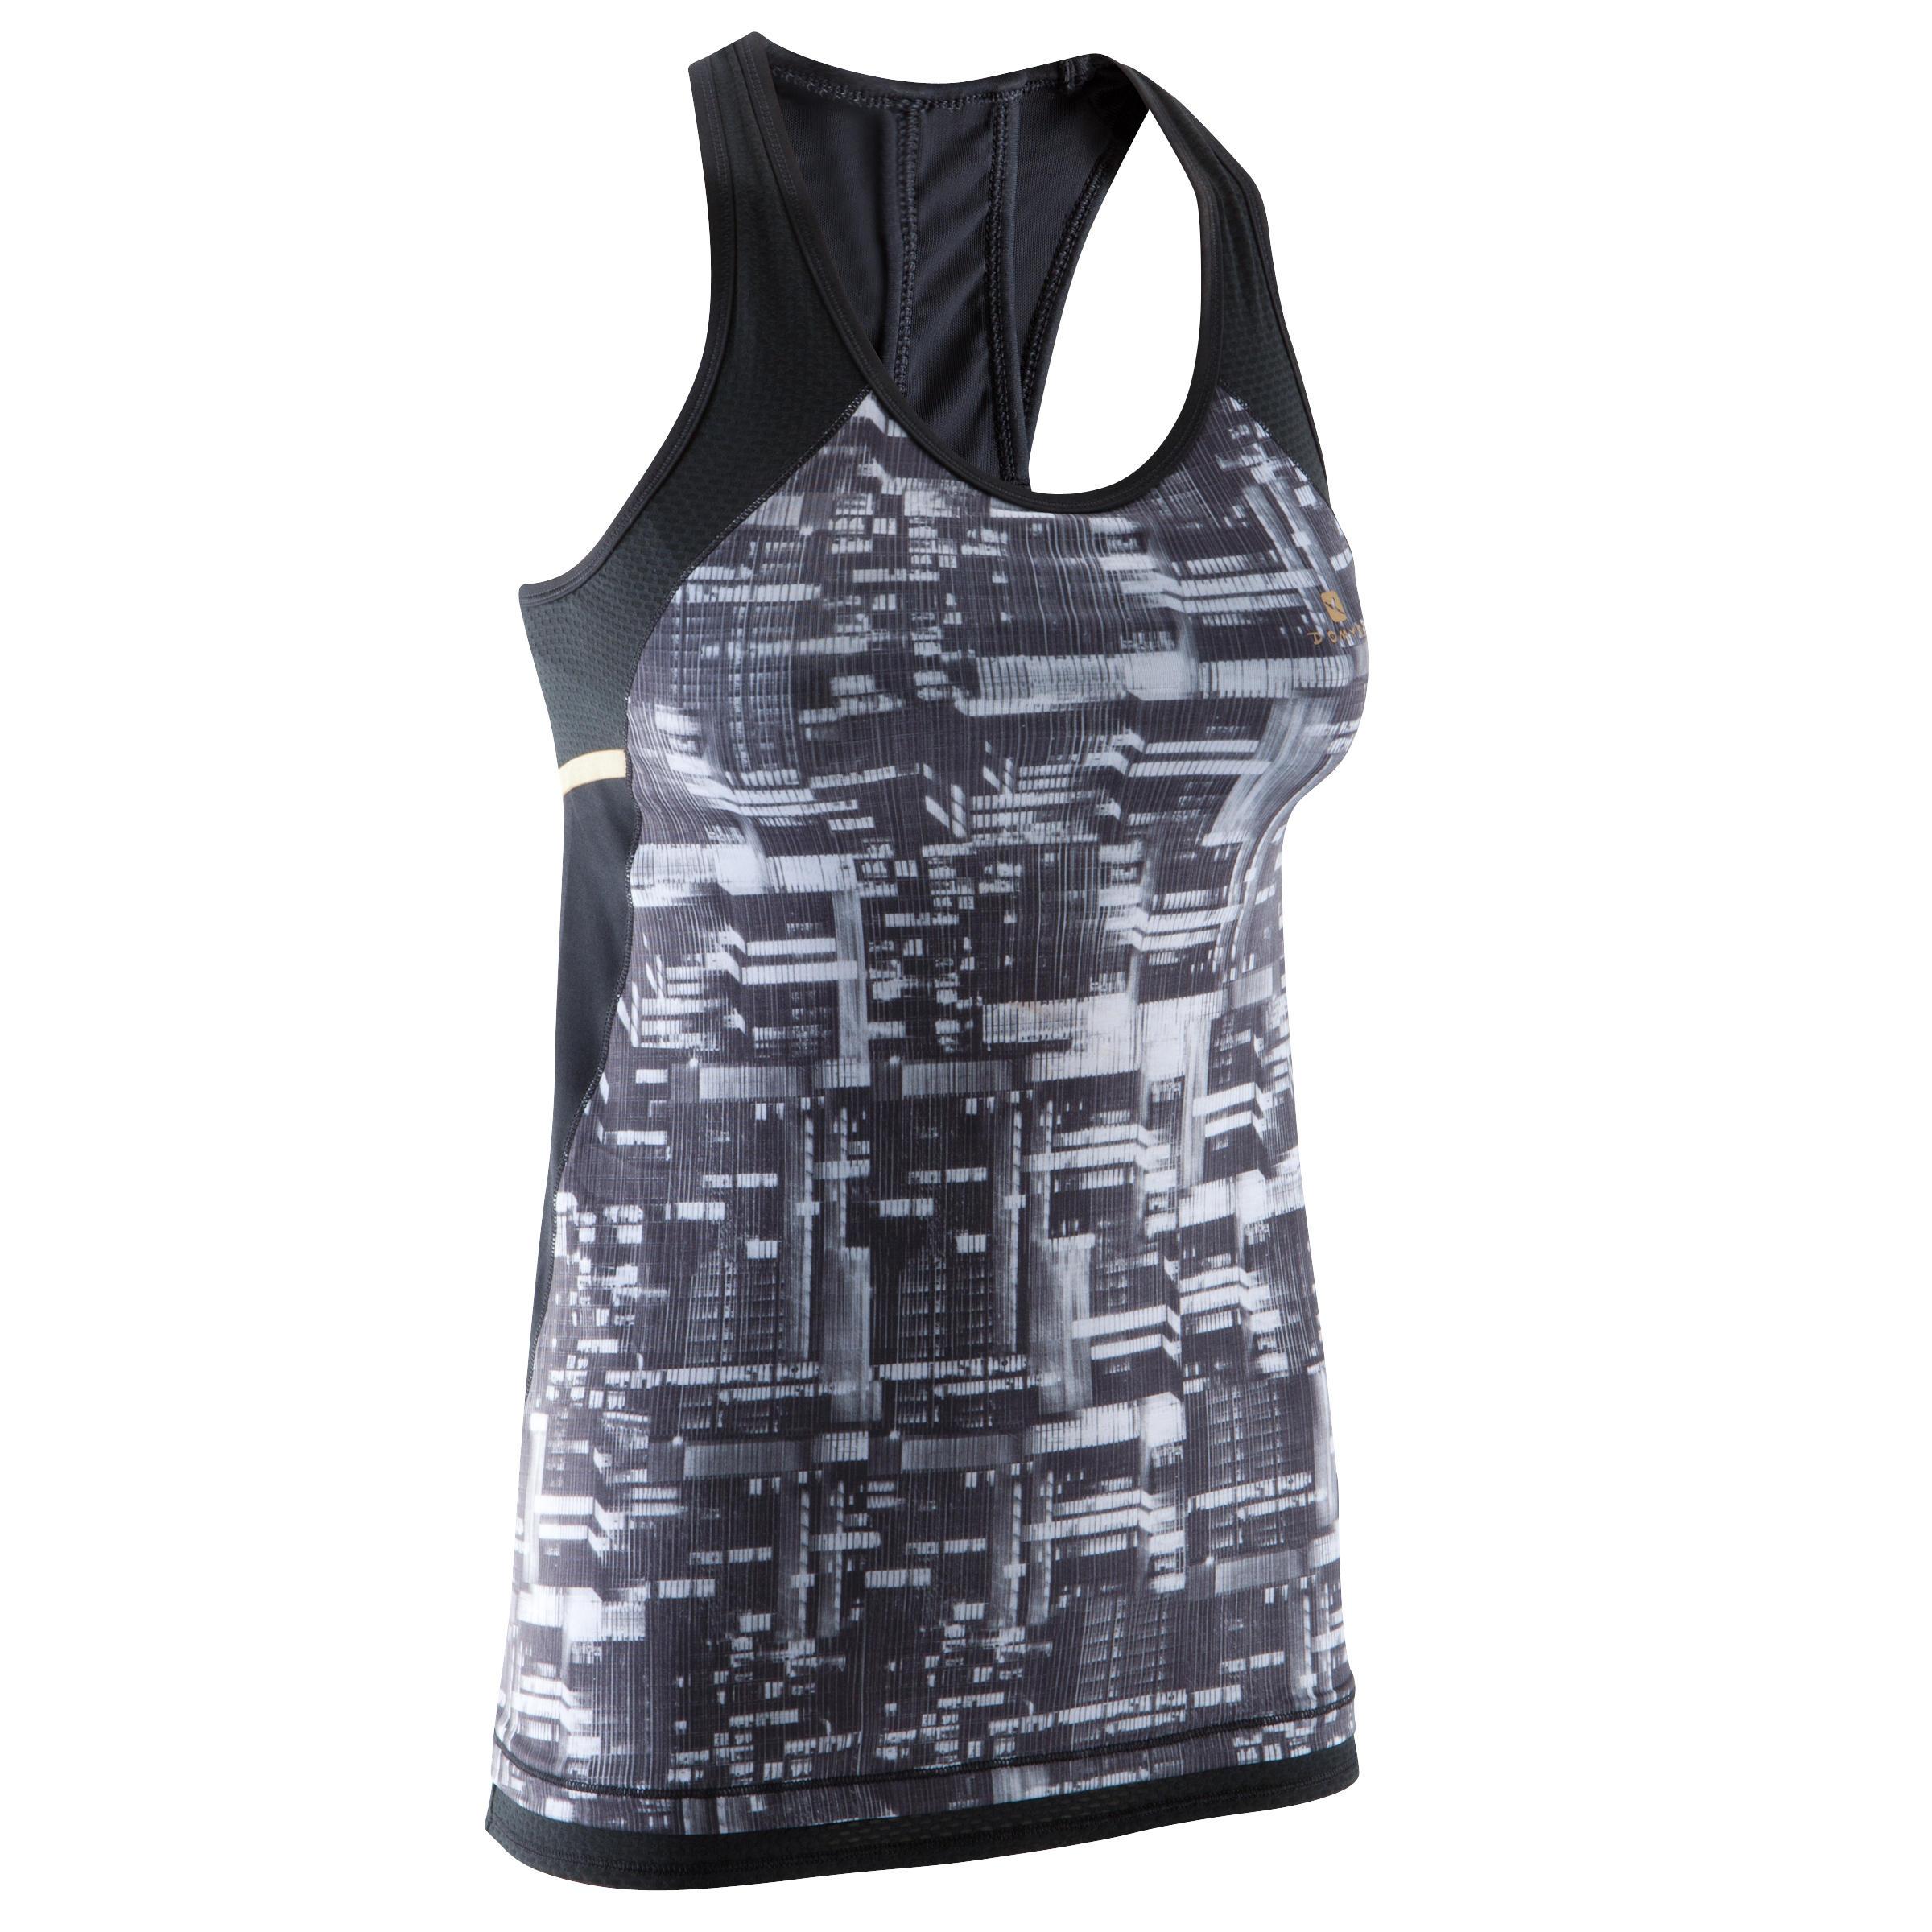 Energy Xtrem Women's Cardio Tank Top with Built-in Bra - Hitam dan Putih